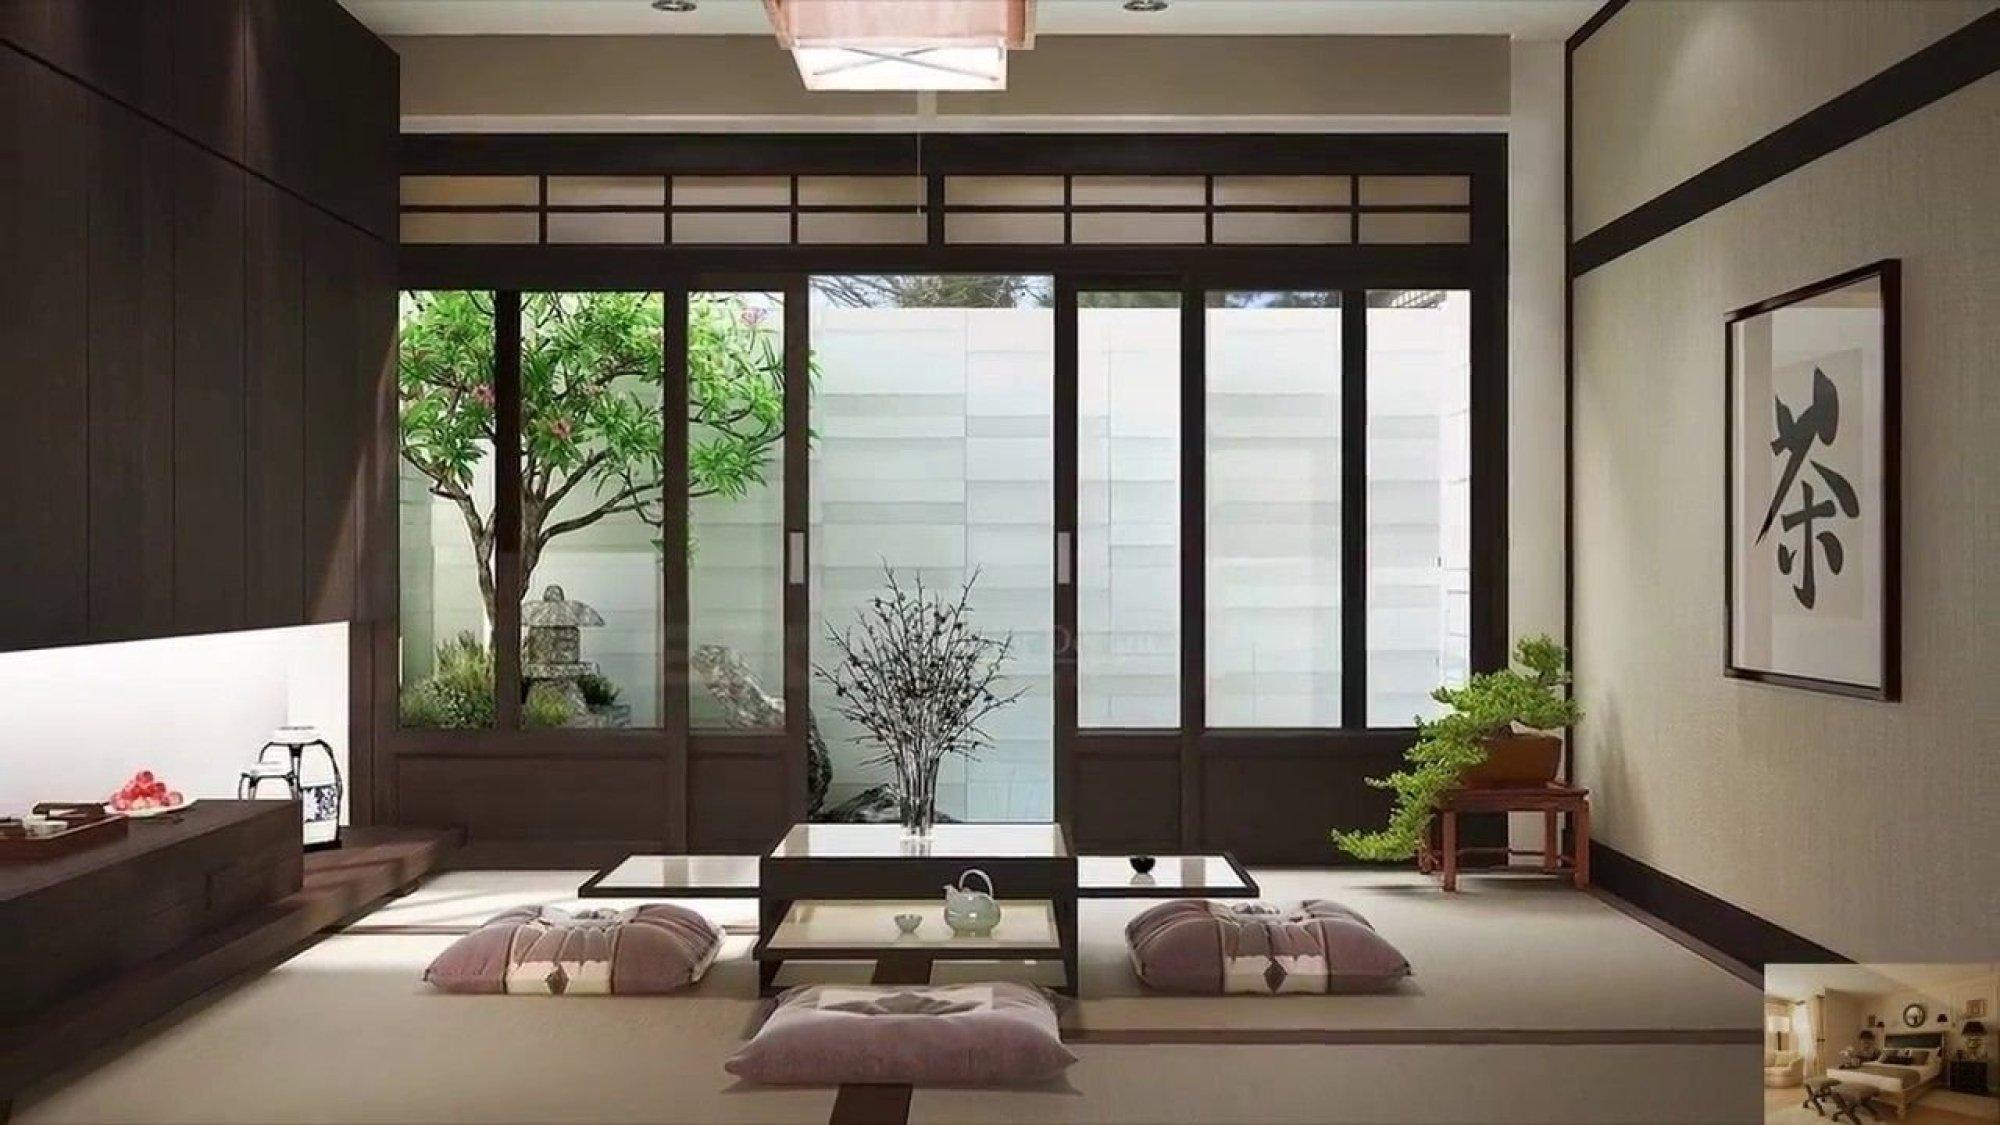 e2c7d47d42ff666db26bf2cb5b7b4085 - Интерьер дома в японском стиле